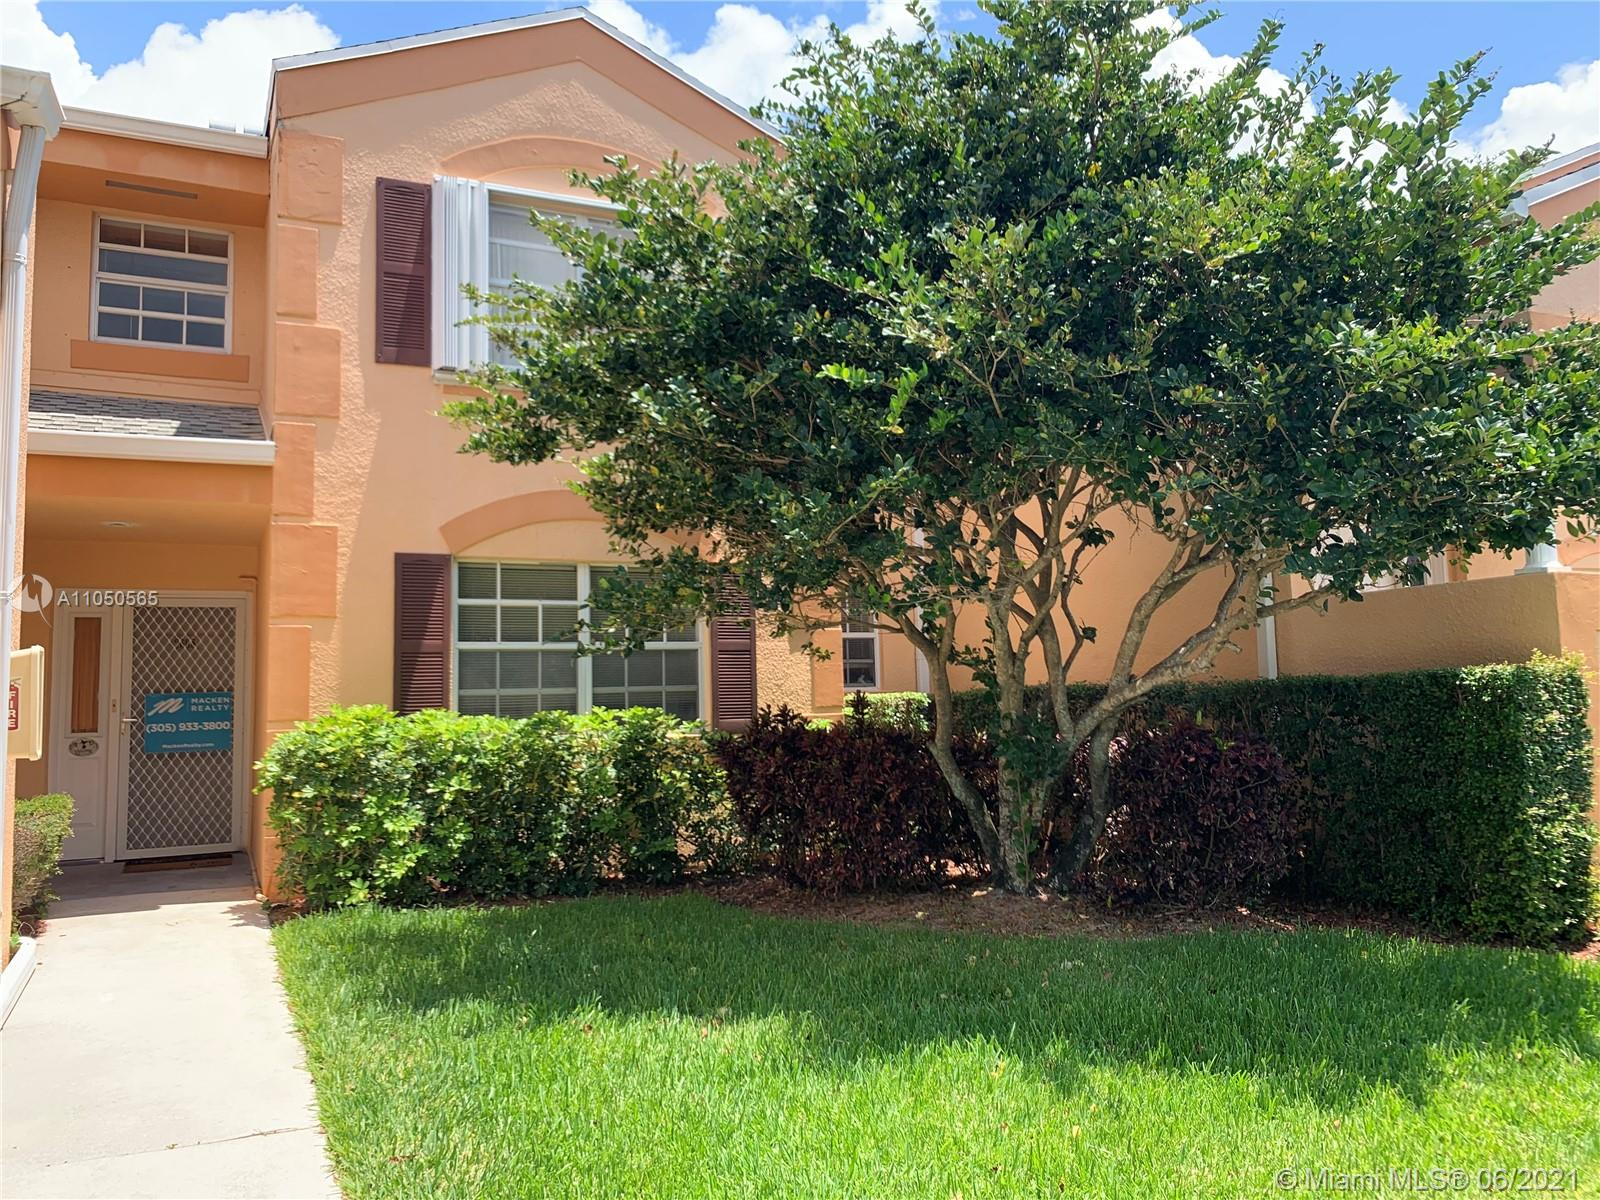 Keys Gate Condo No One Real Estate Listings Main Image